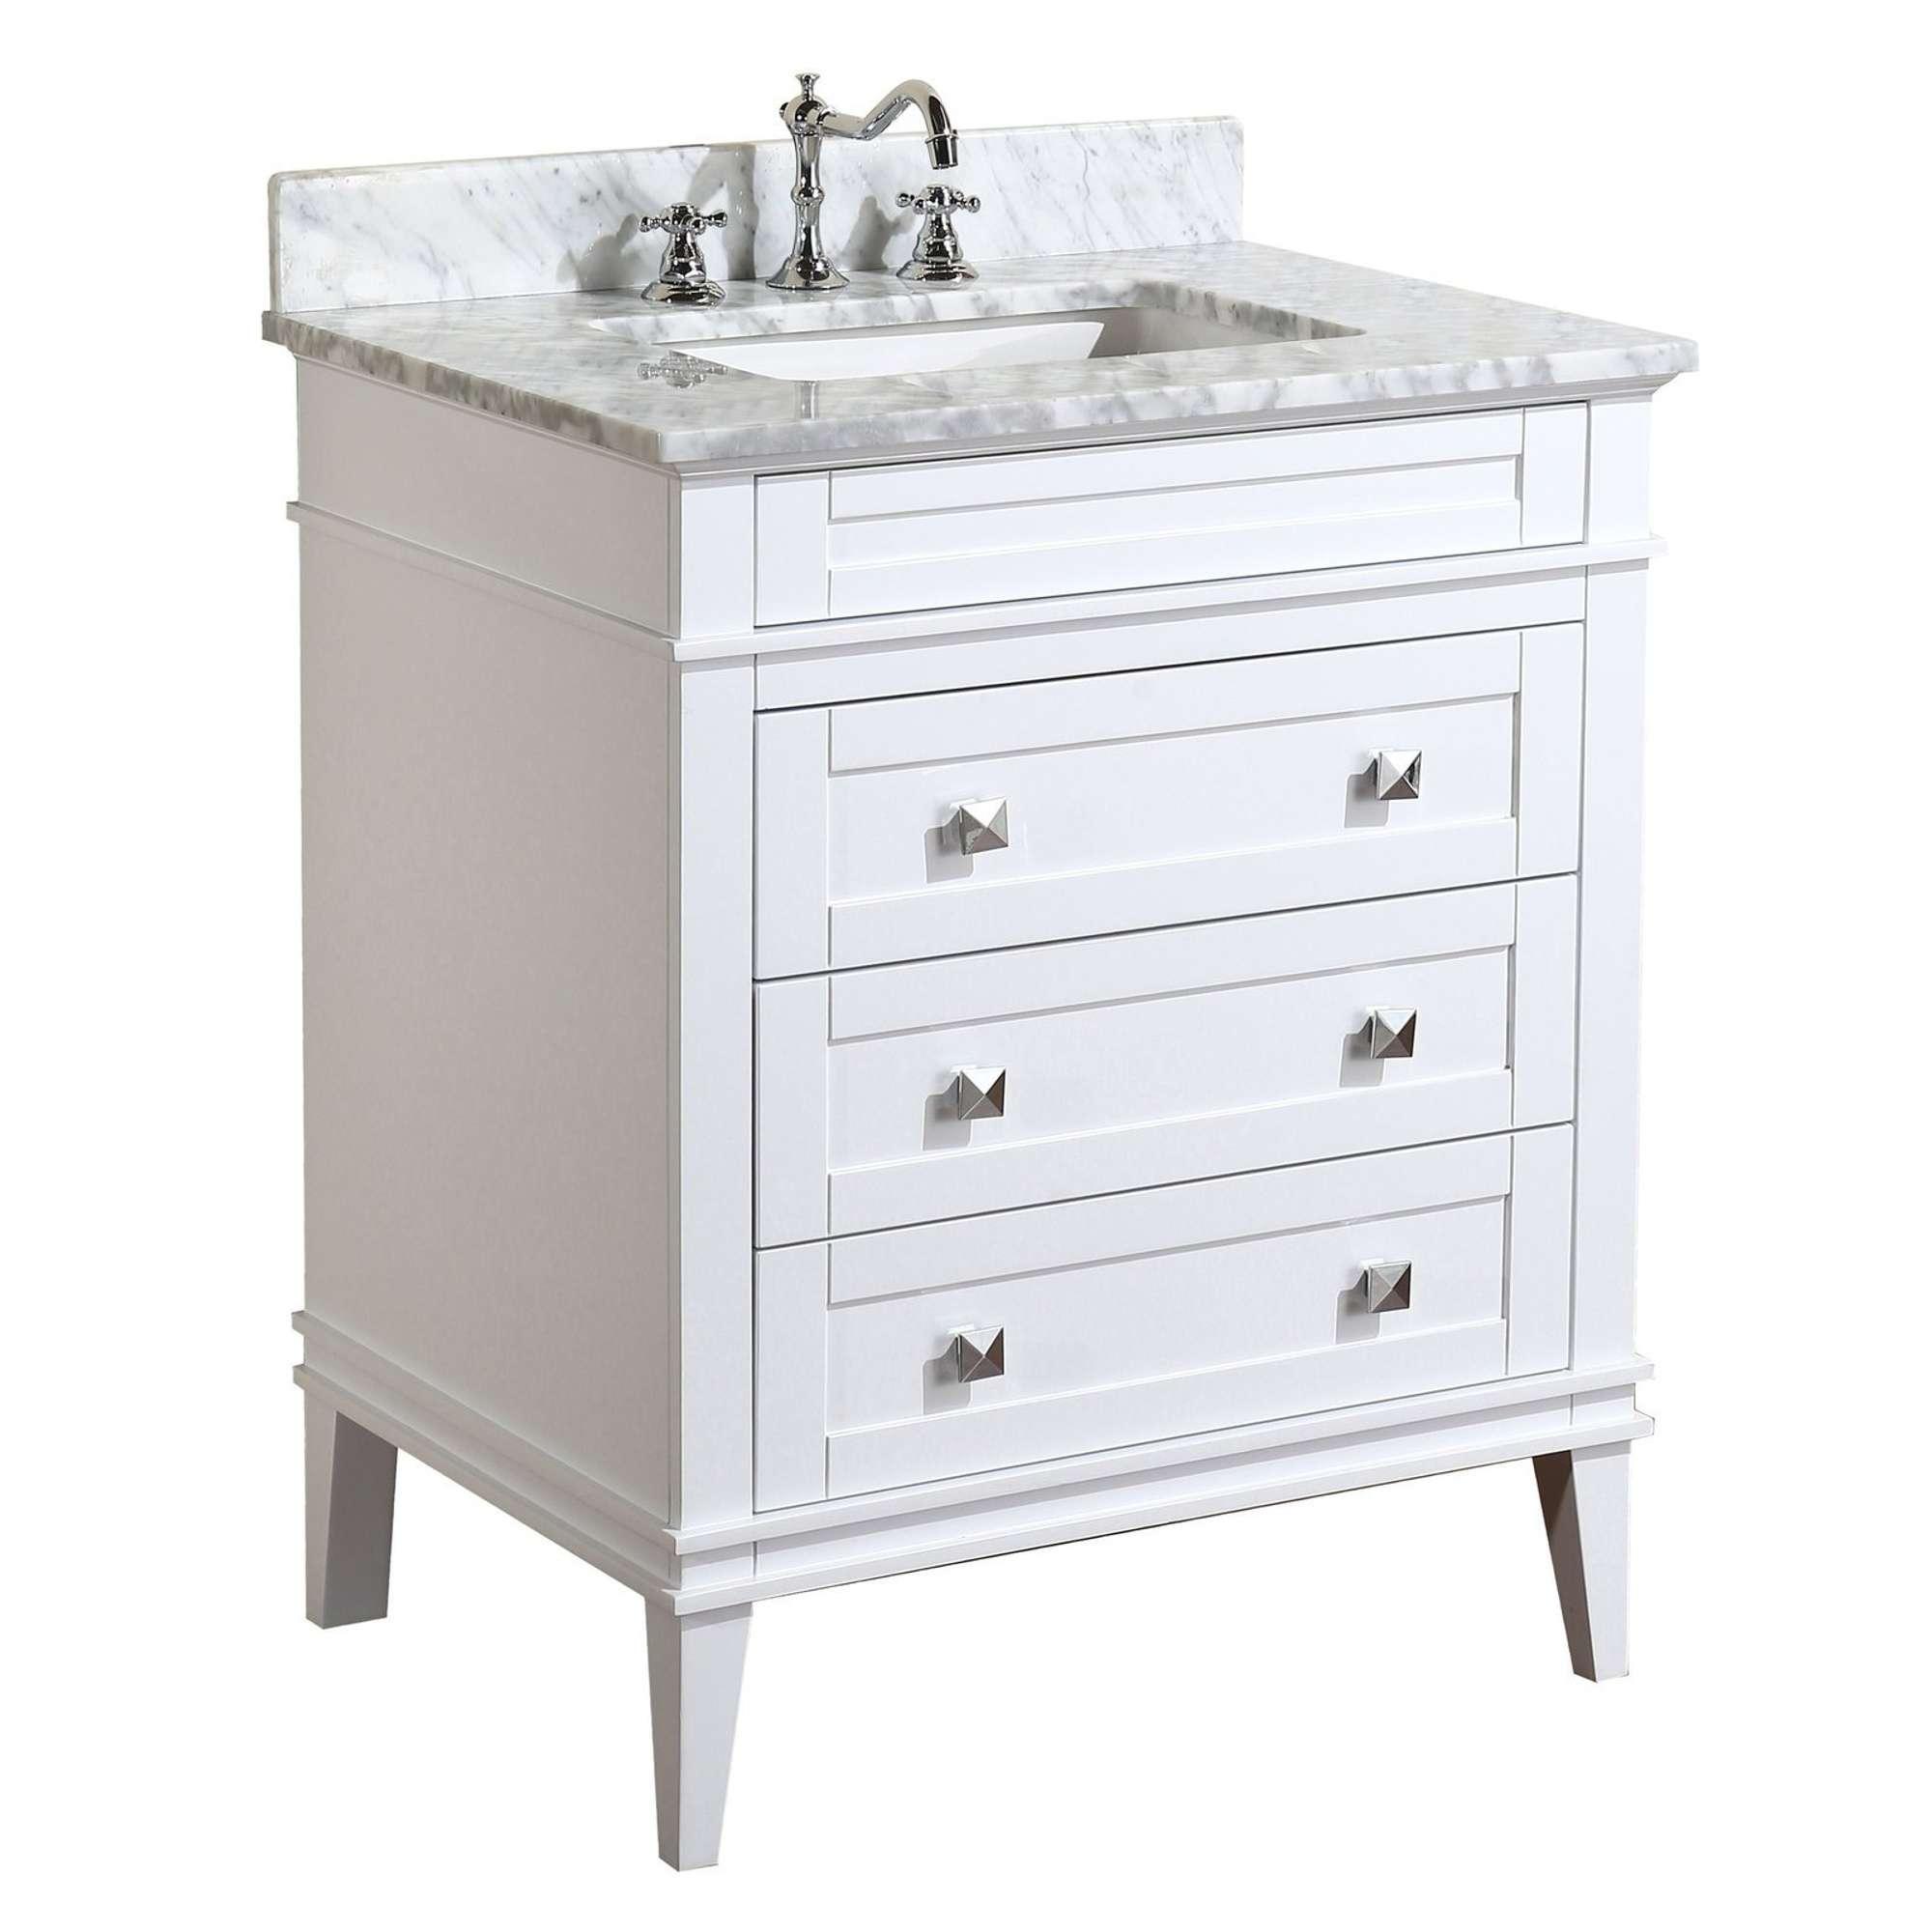 Partial Eleanor 30 Bathroom Vanity Damaged Loveseat Online Auctions San Diego